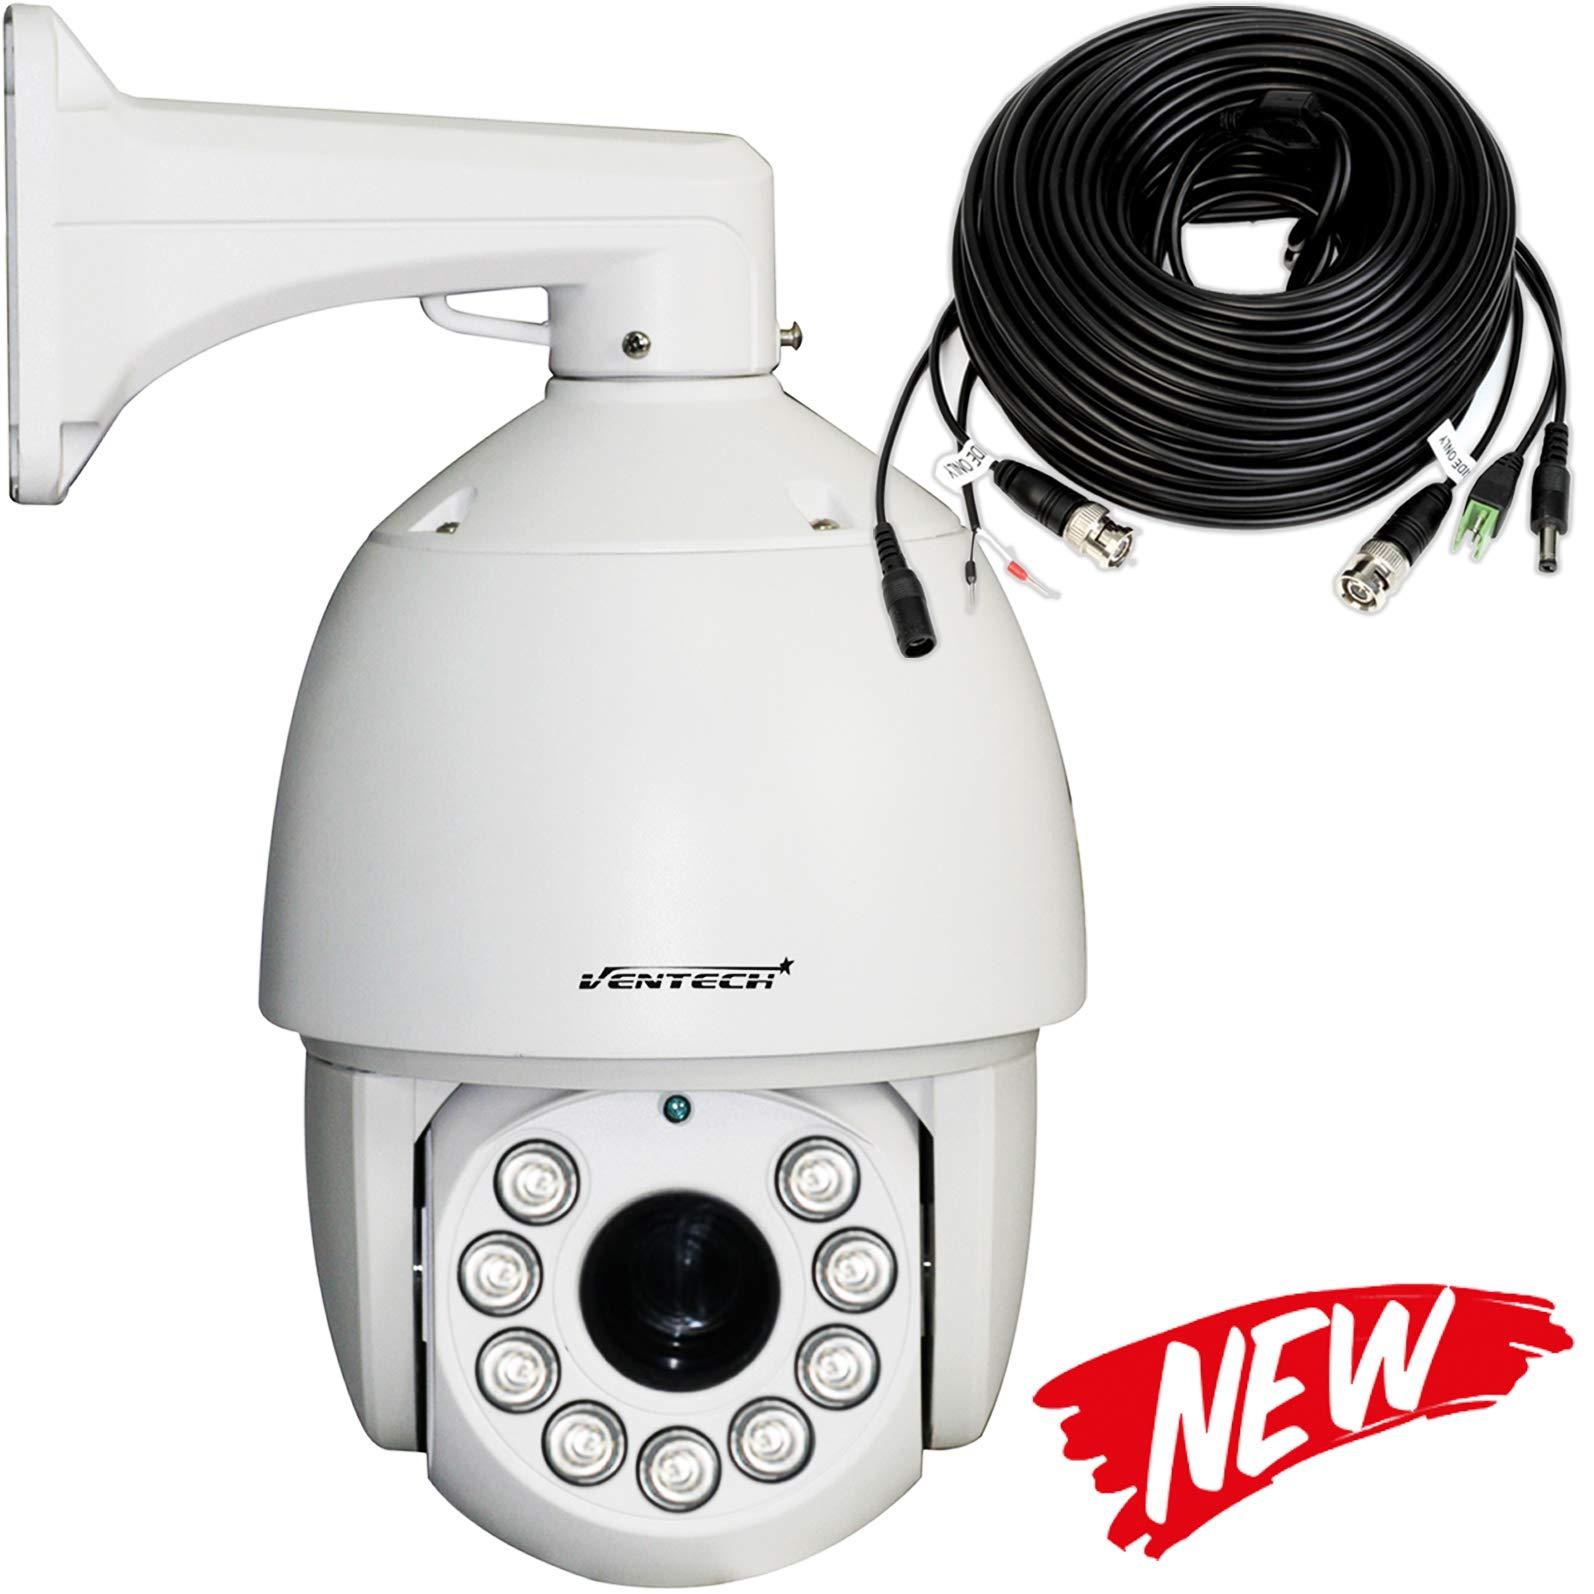 amazon com ventech ptz camera outdoor analog cctv pan tilt zoom